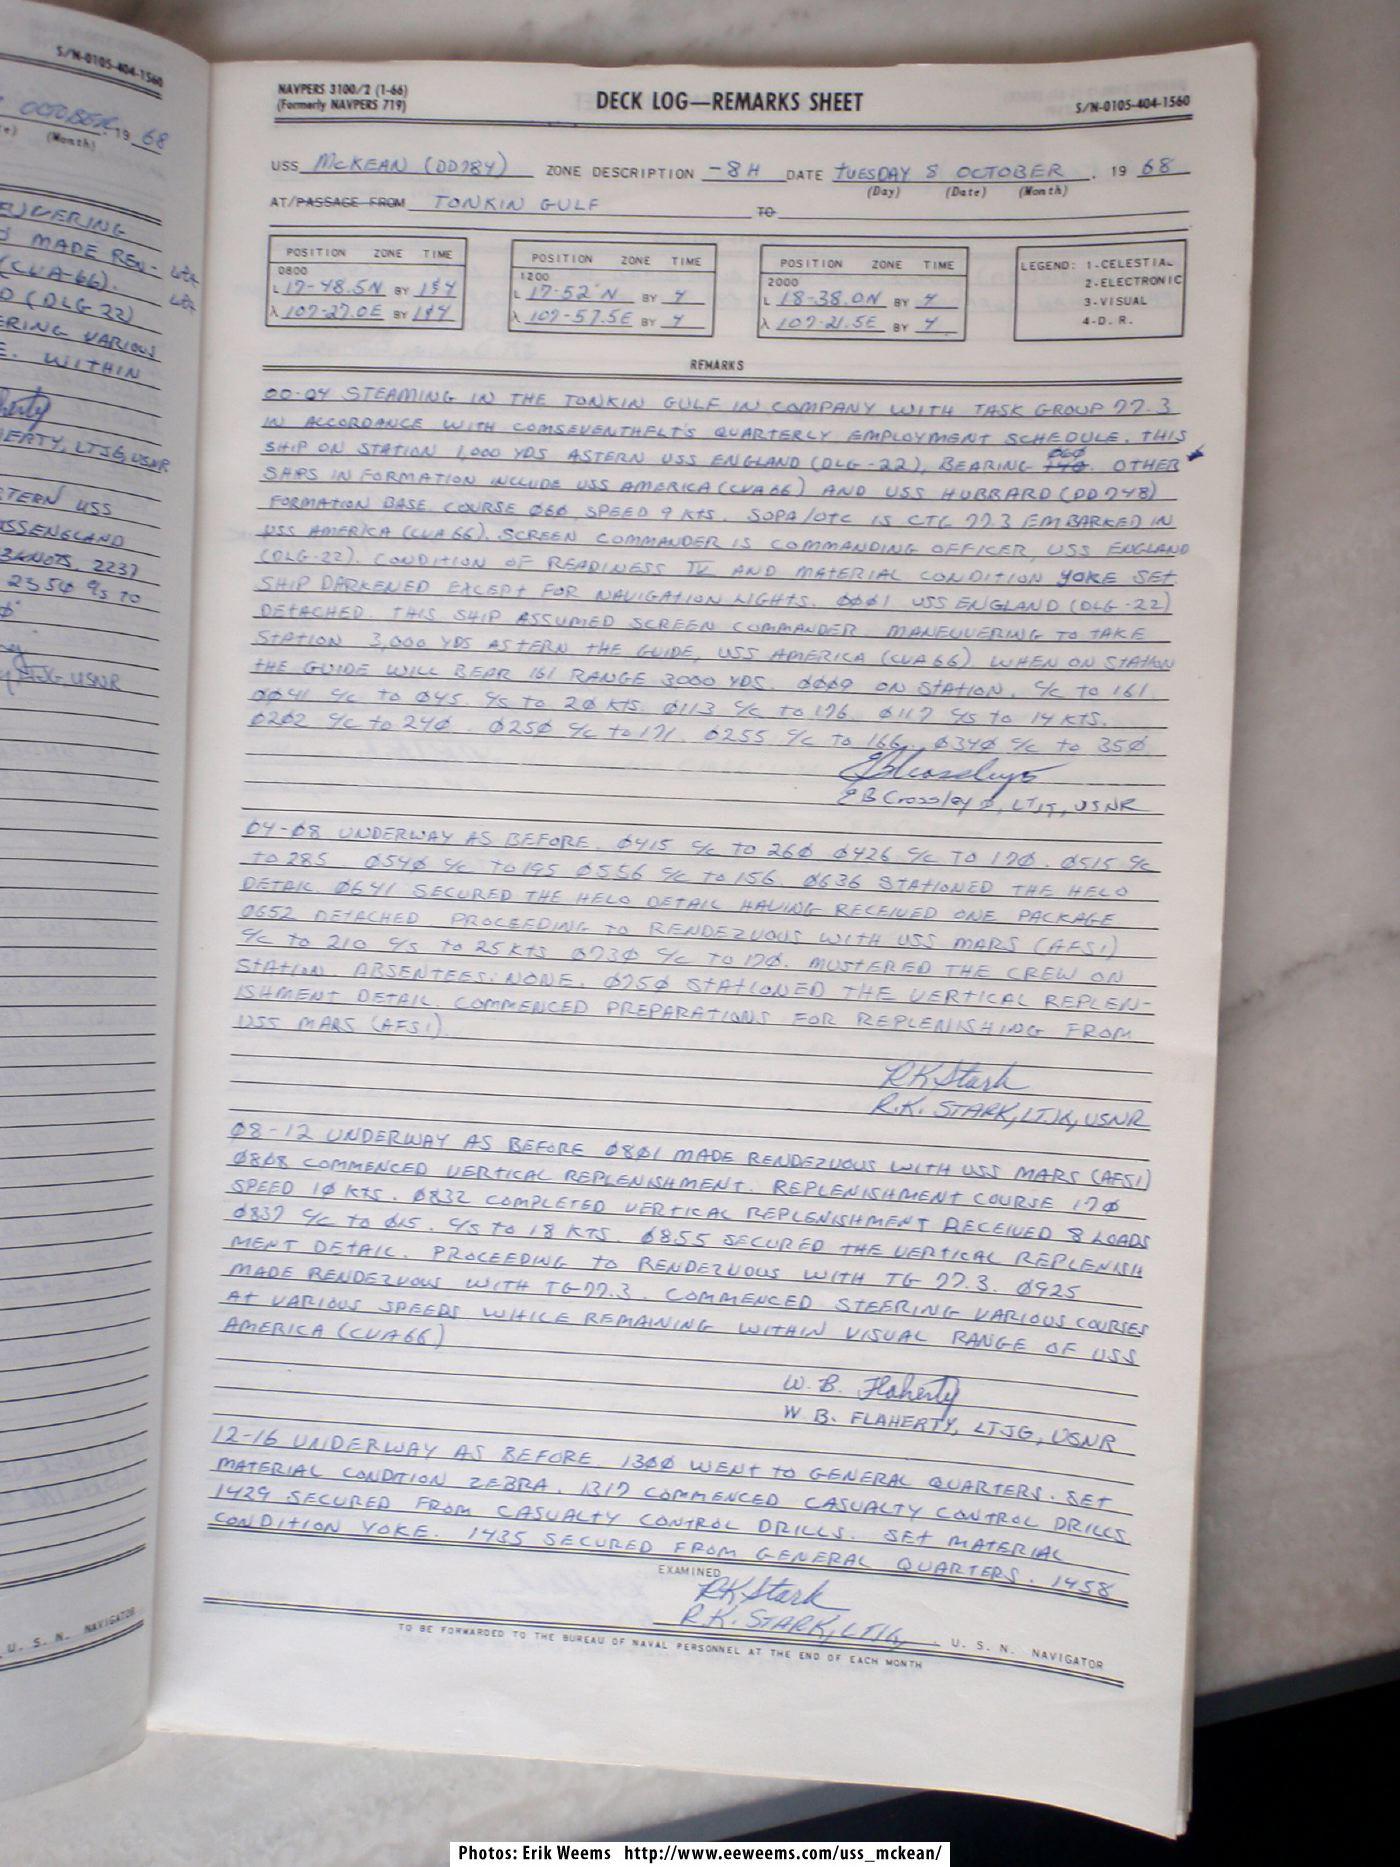 Mckean Dd784 Deck Logs 1968 371 Jpg Uss Mckean Deck Logs 1968